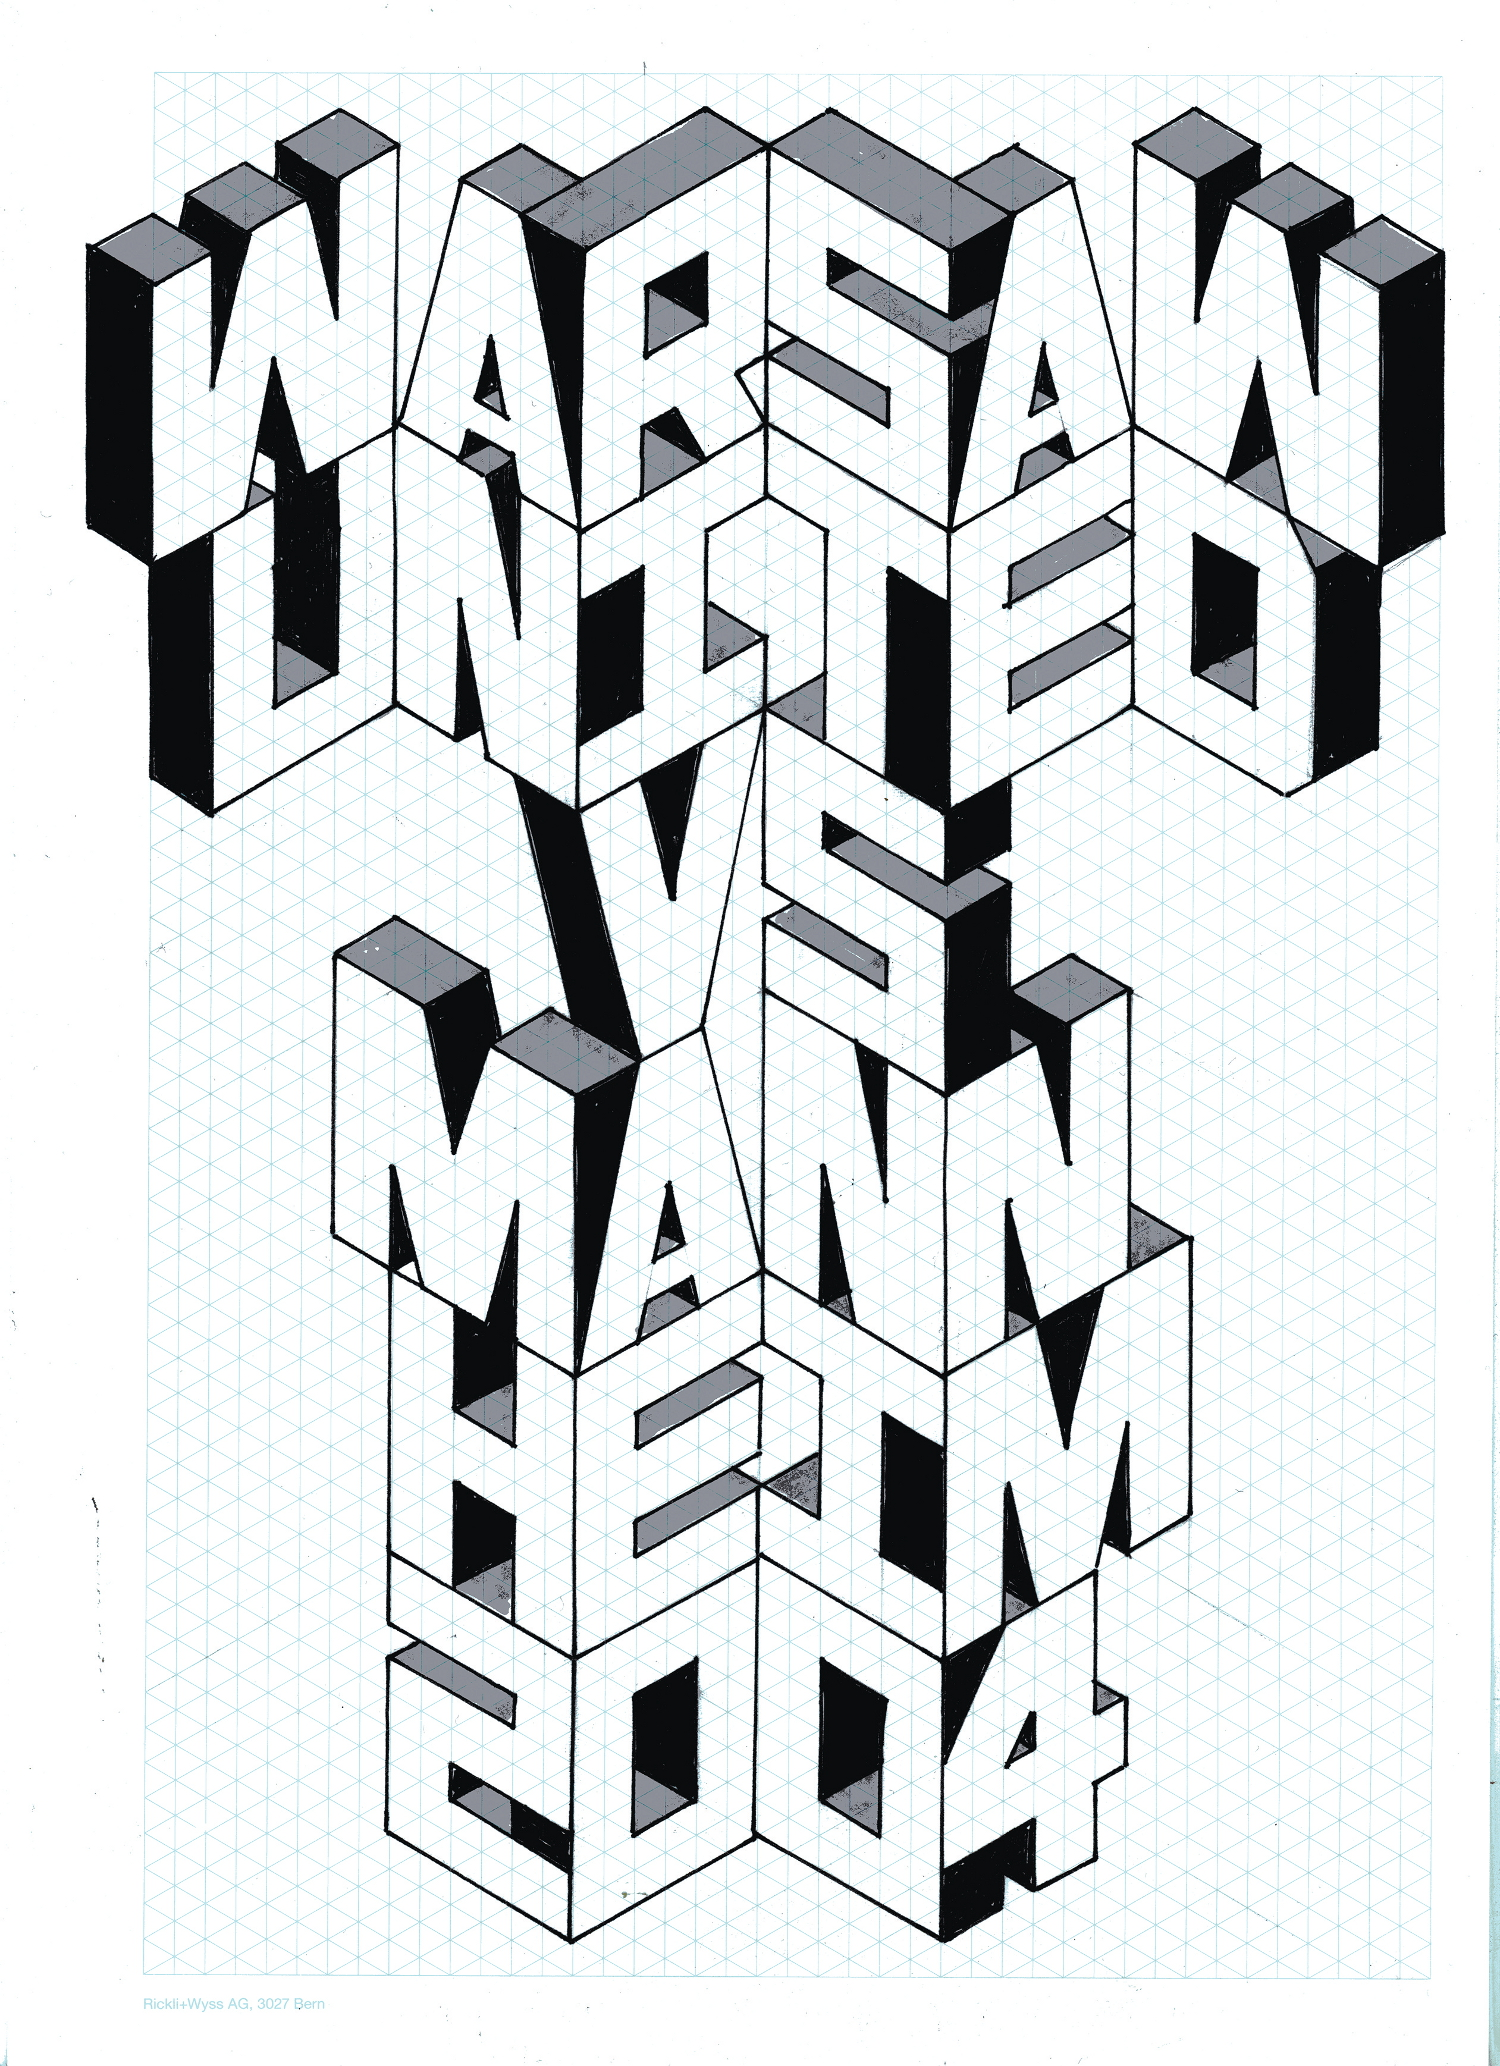 warsaw.jpeg